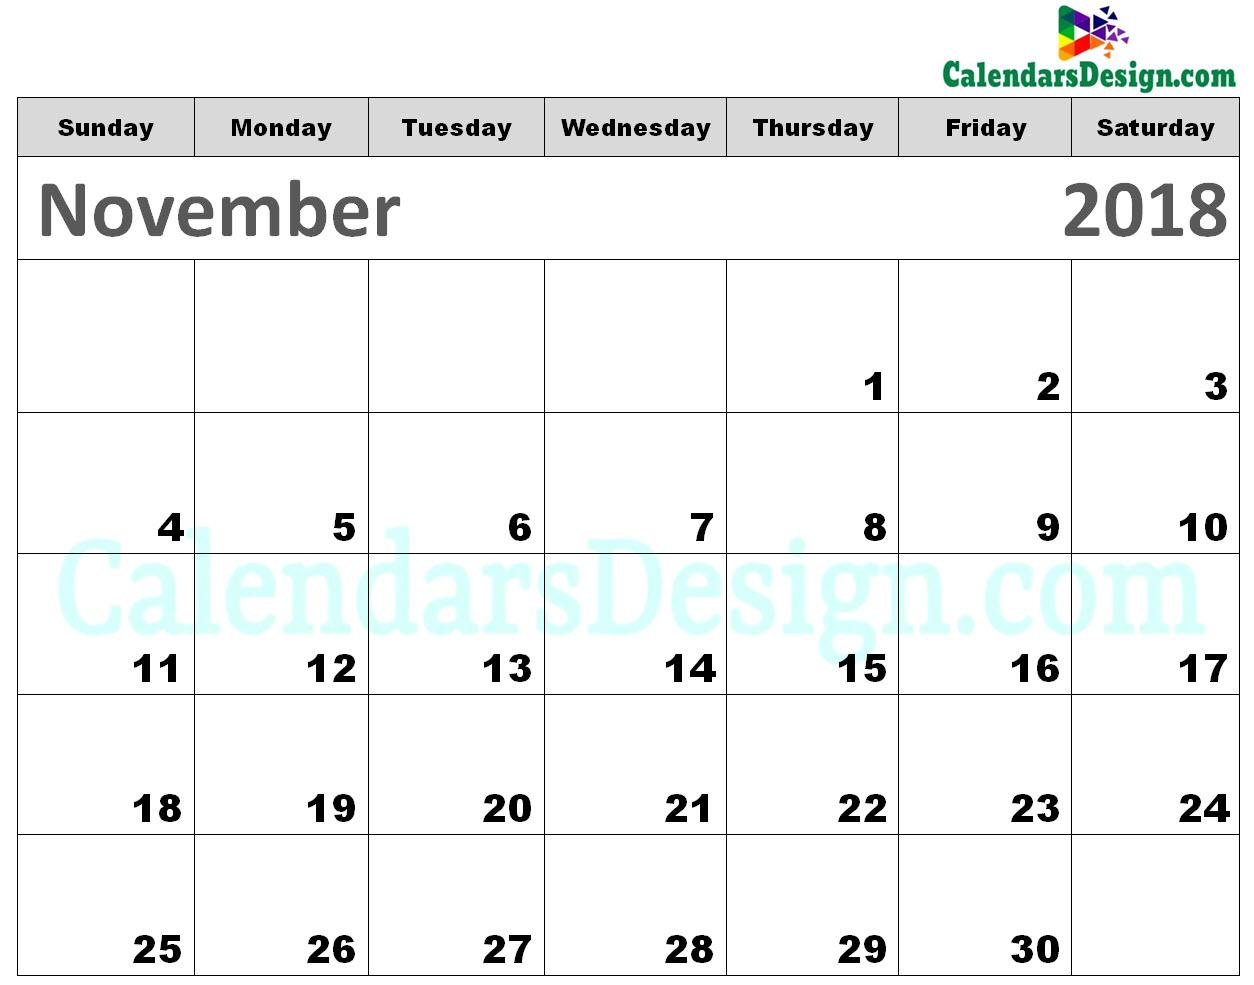 Printable Calendar for November 2018